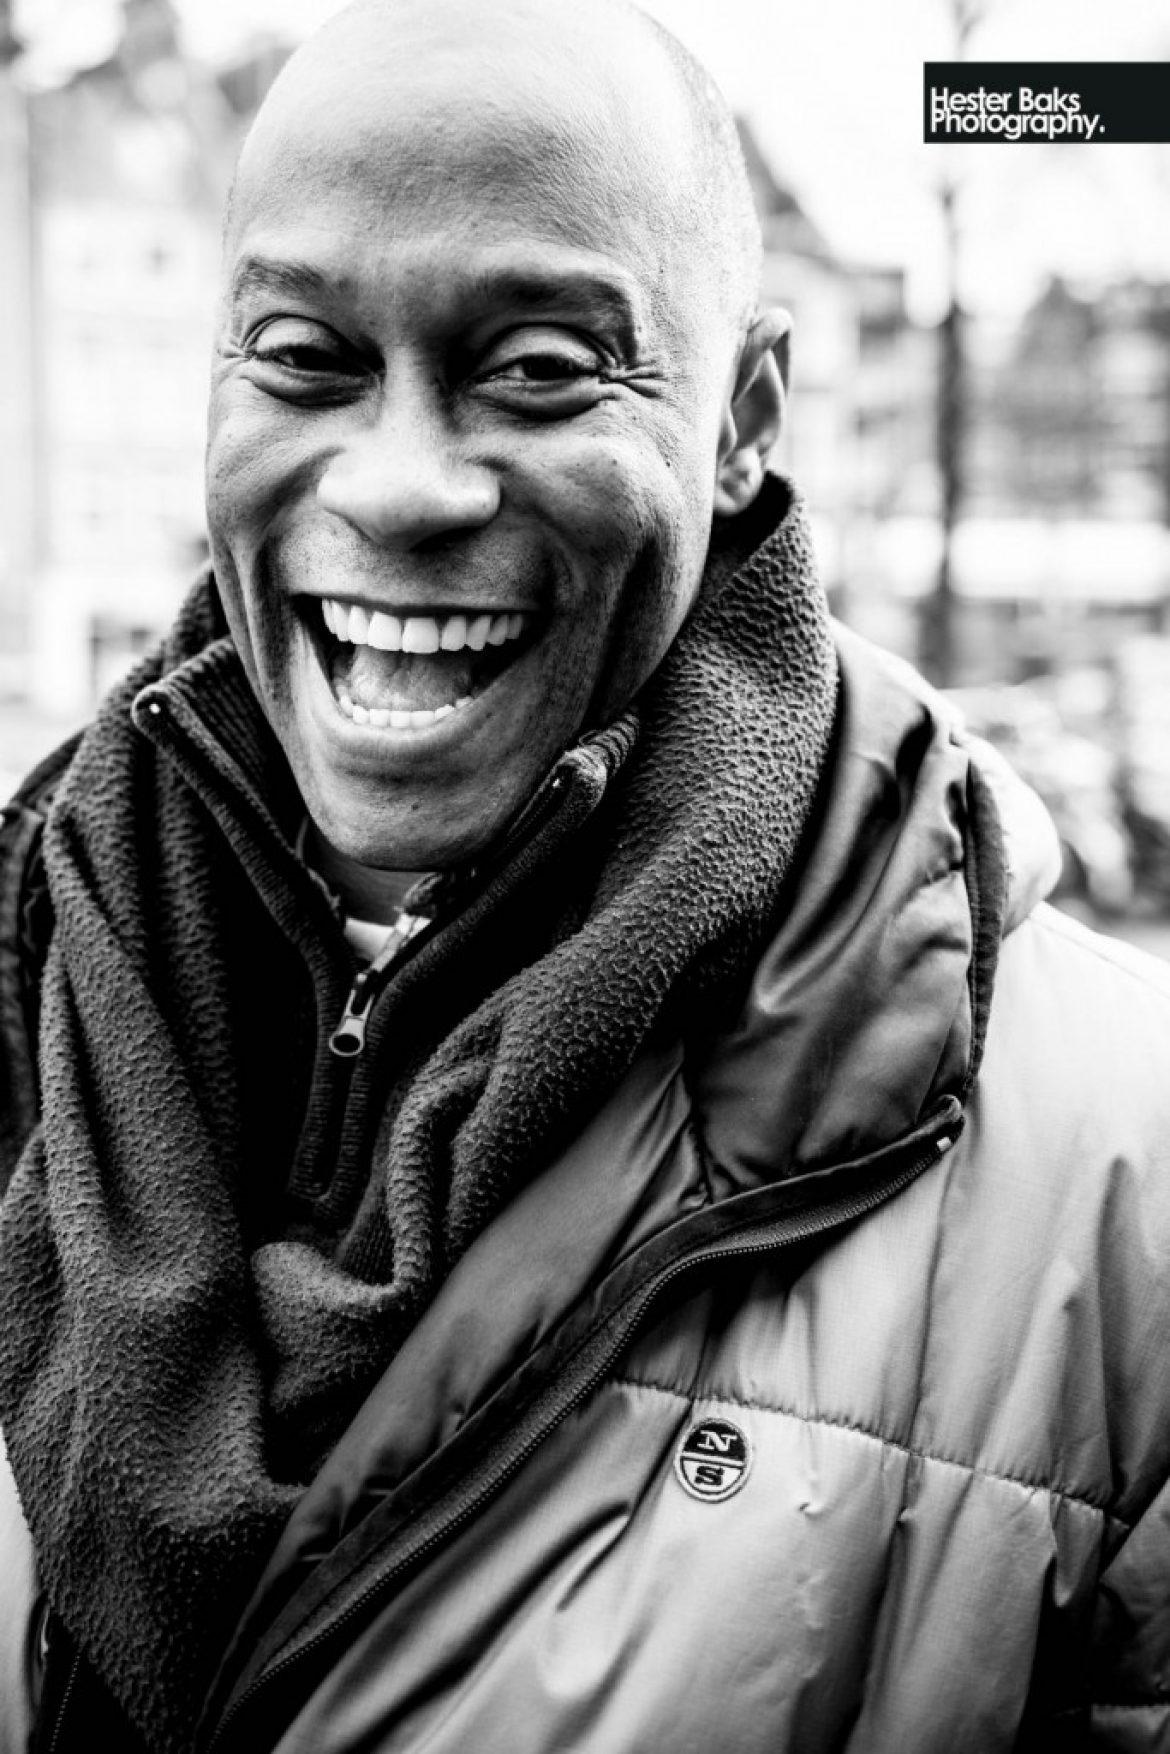 Kenneth Goedhart #blackandwhite #photography #picoftheday #streetphotography #portrait